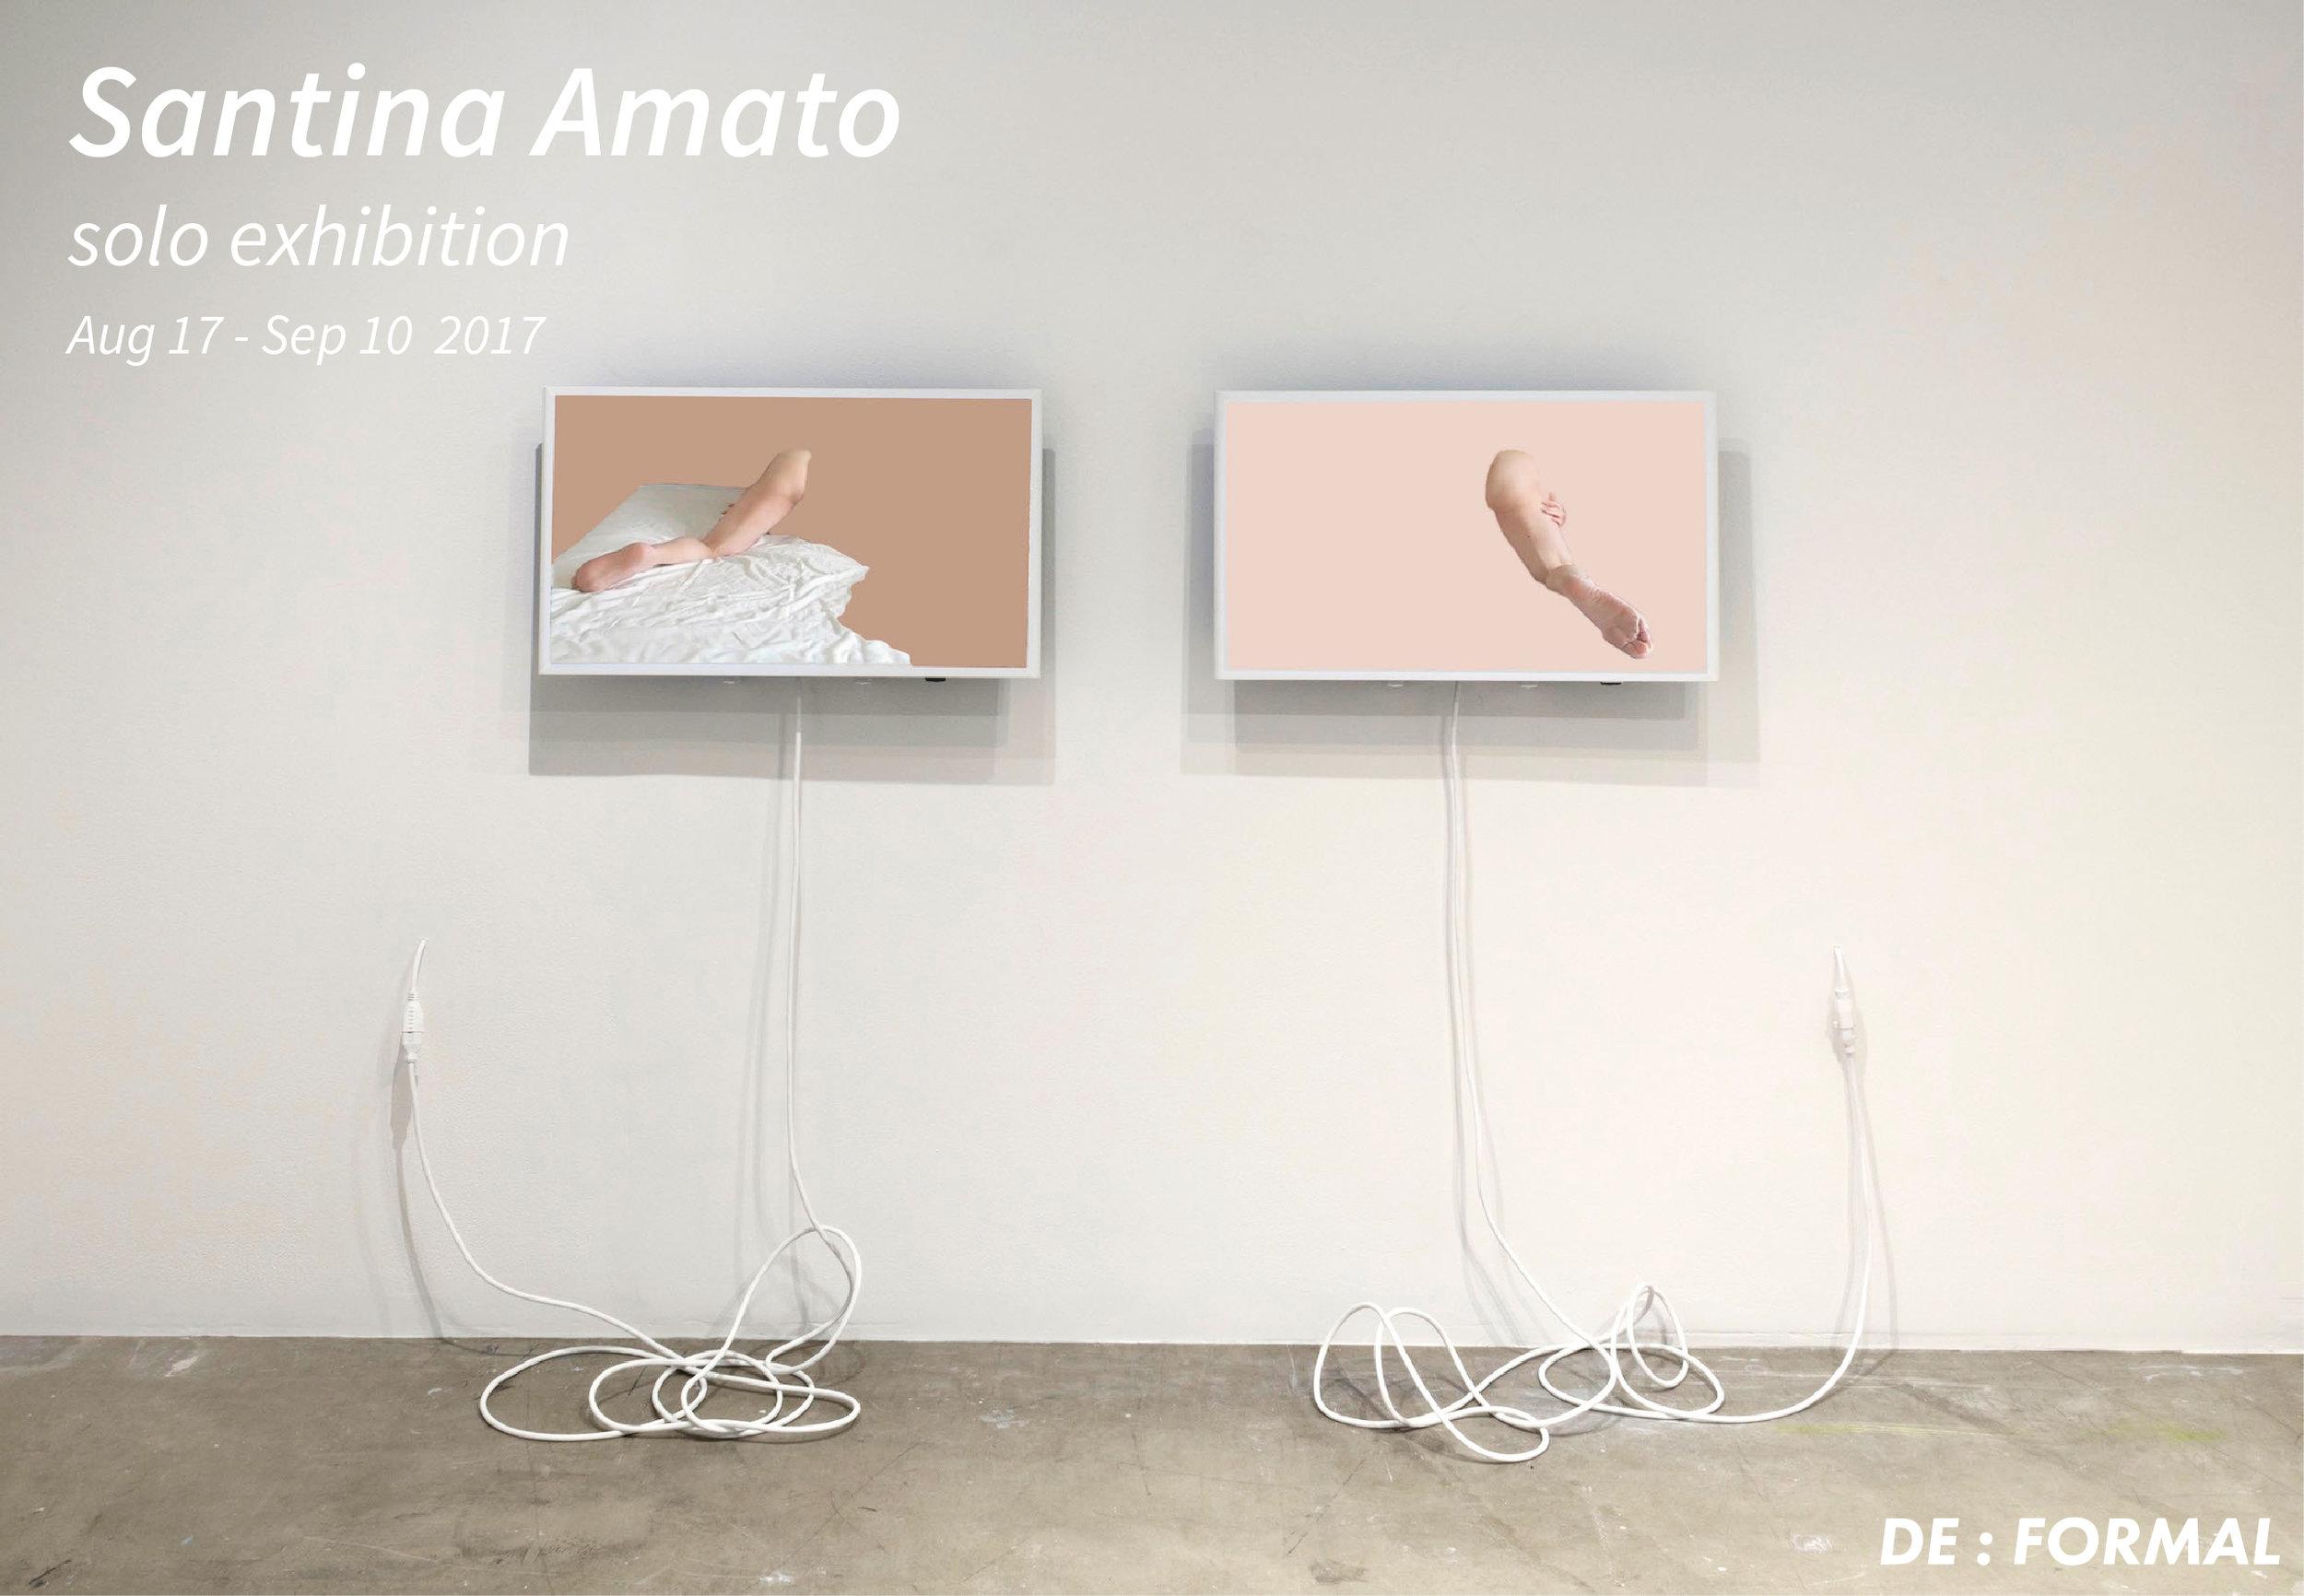 Amato_Santina_Poster-01.jpg